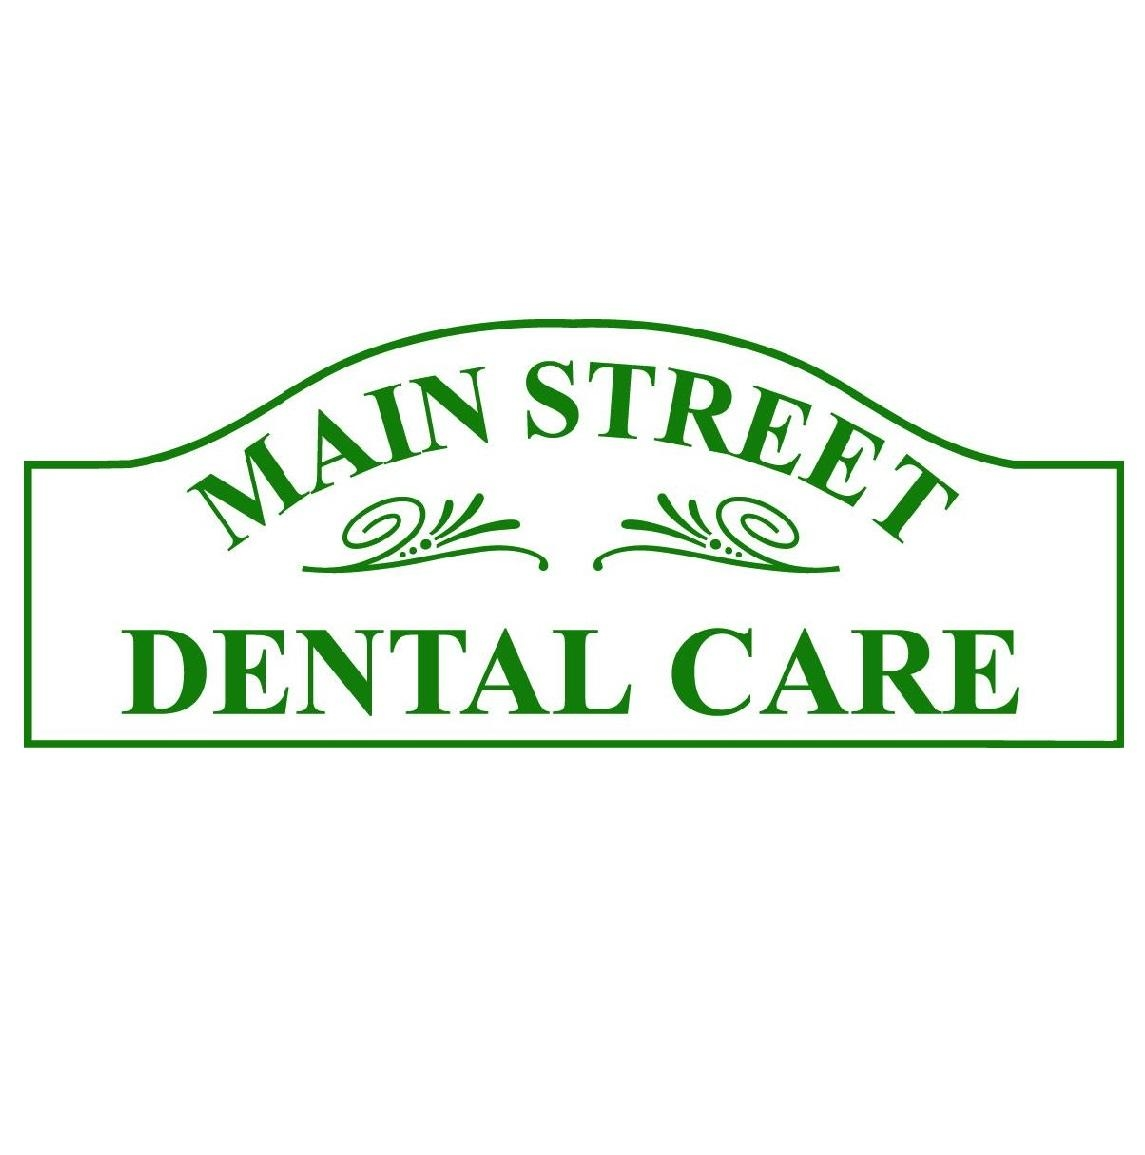 Main Street Dental Care - Dr. Butler and Dr. Villarreal